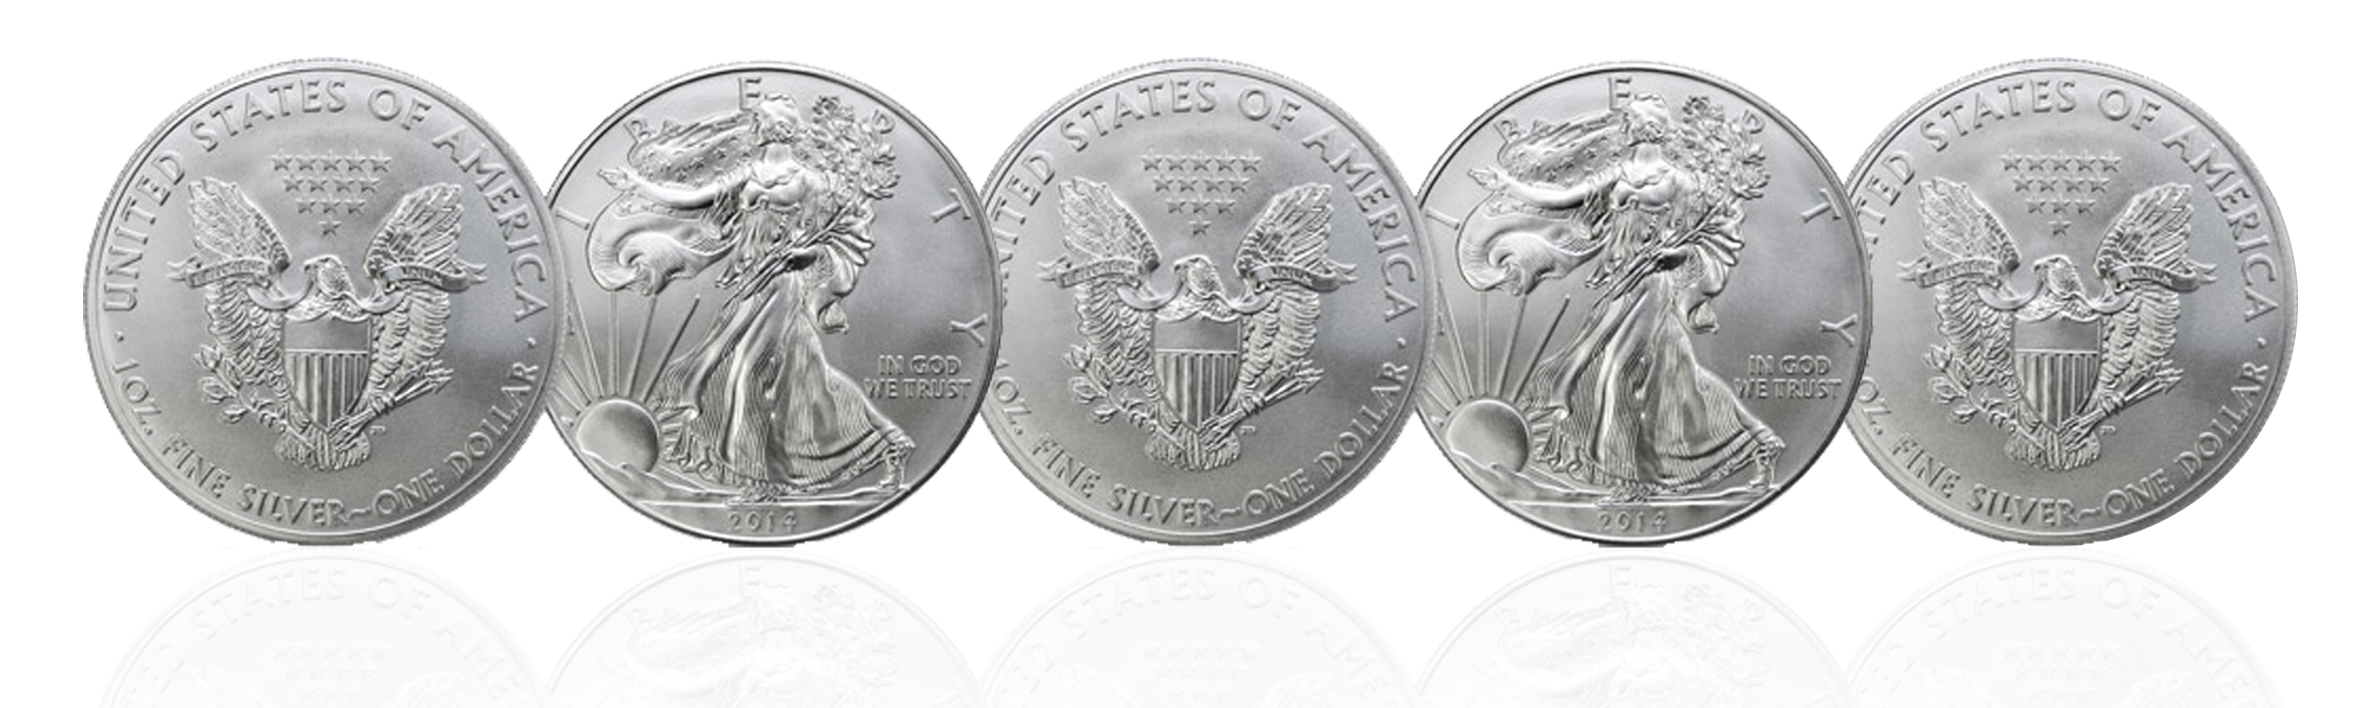 Buy American Silver in Ireland